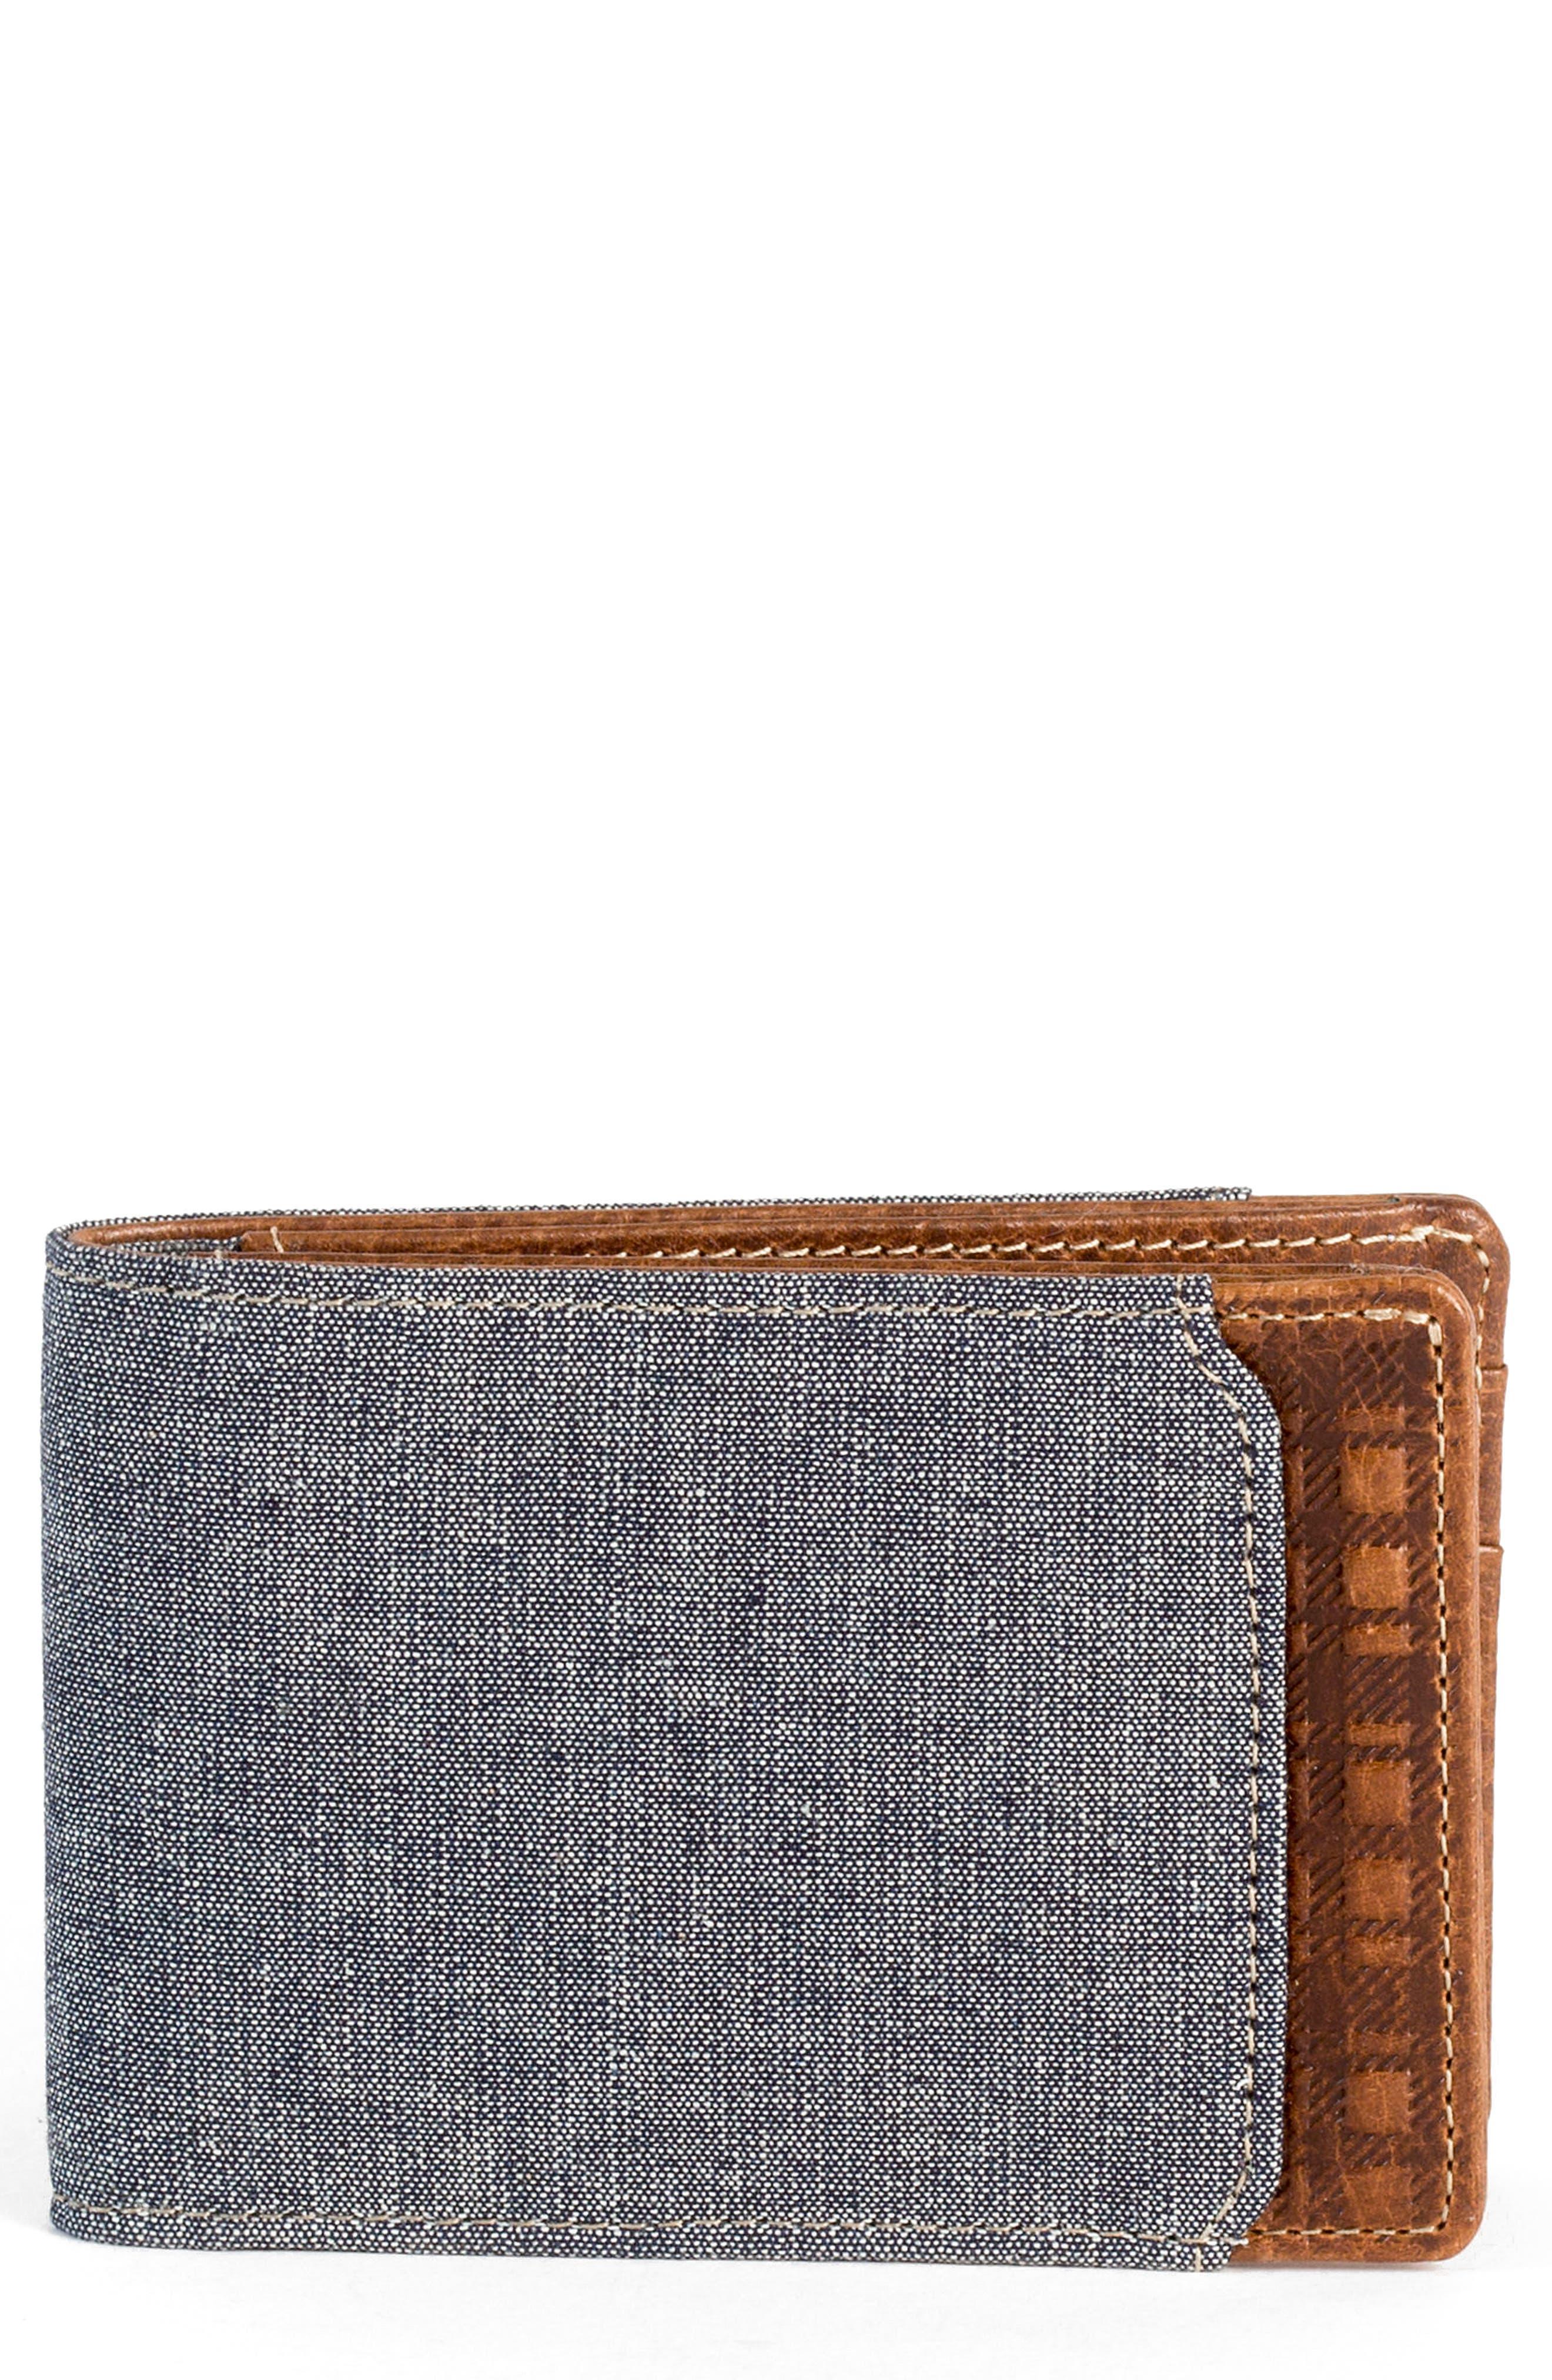 Caleb LTE Wallet,                         Main,                         color, Chestnut